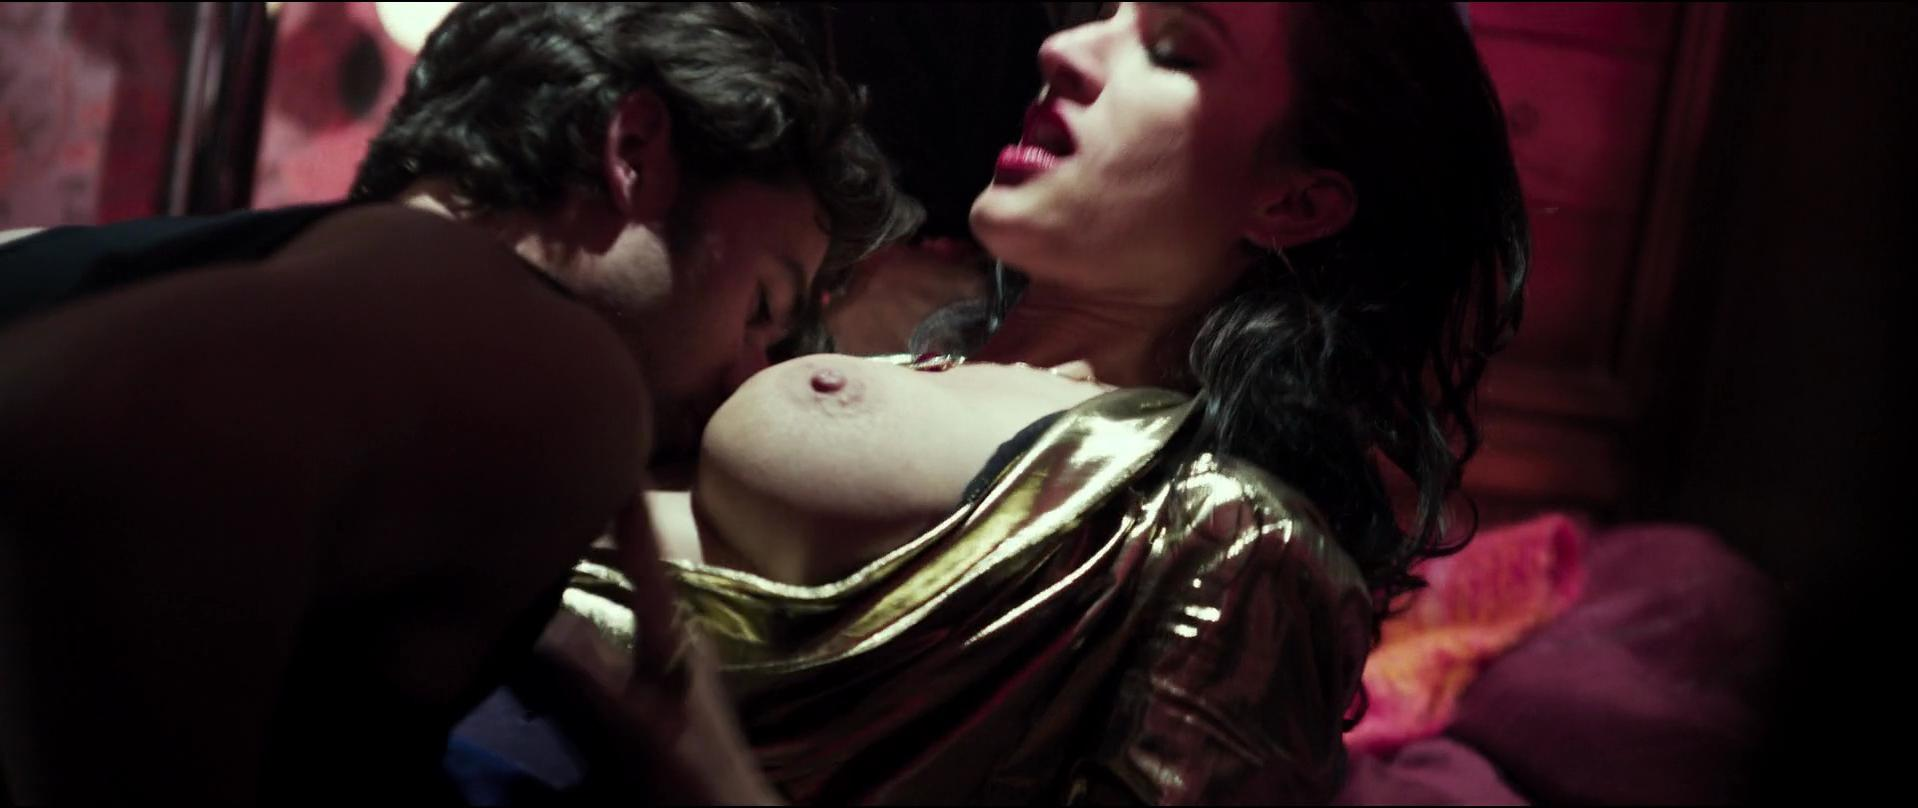 Nude Video Celebs  America Olivo Nude - Maniac 2012-1440